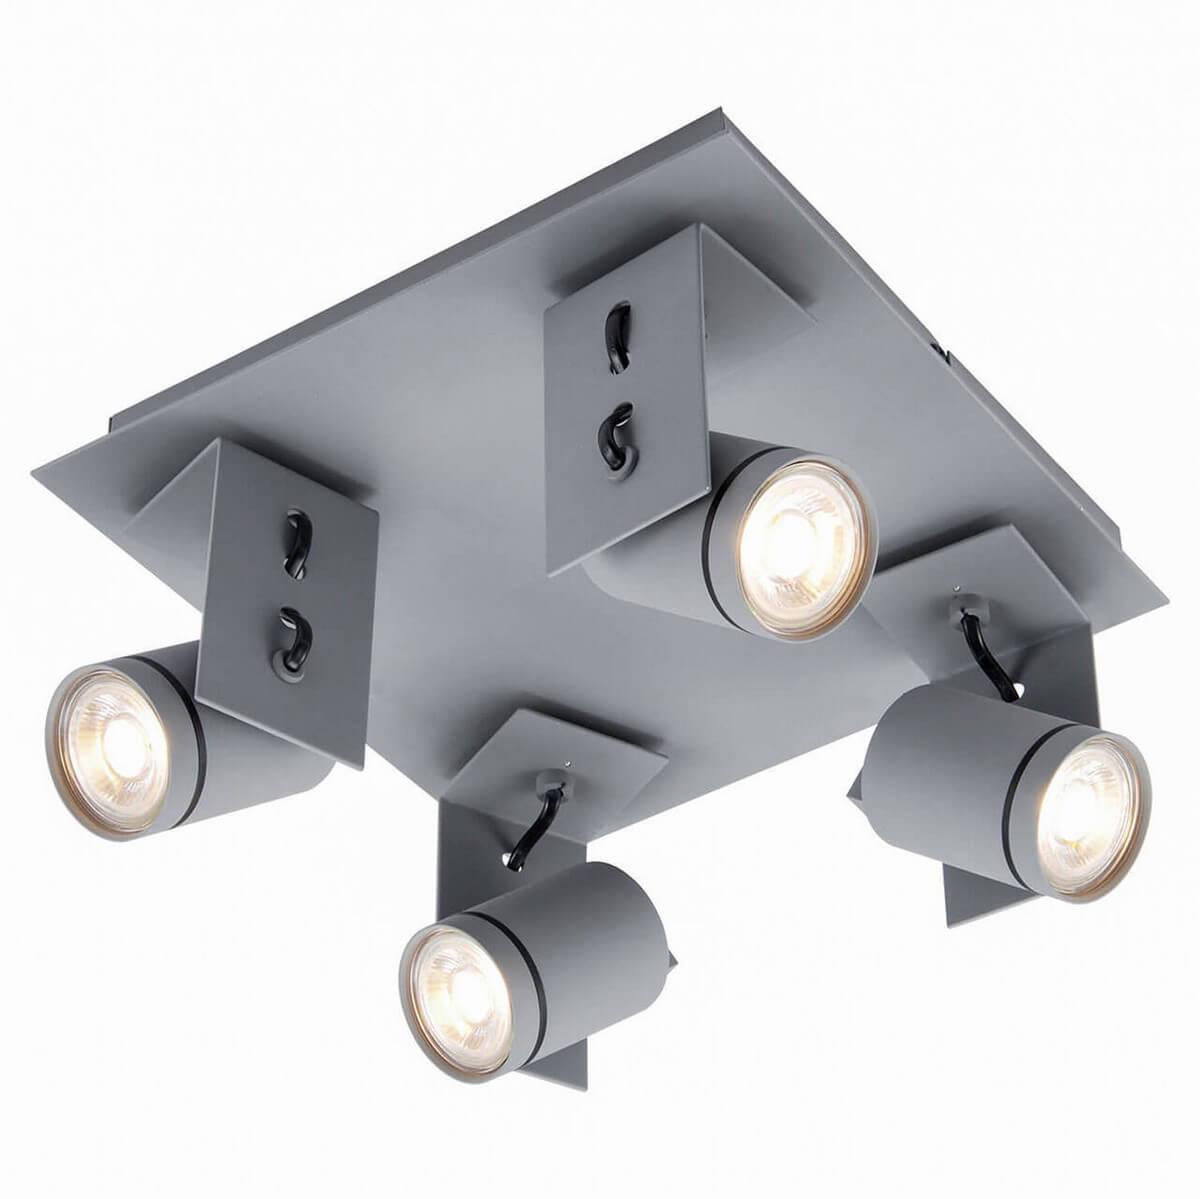 Спот Lussole Loft GRLSP-8024 ideal 8024